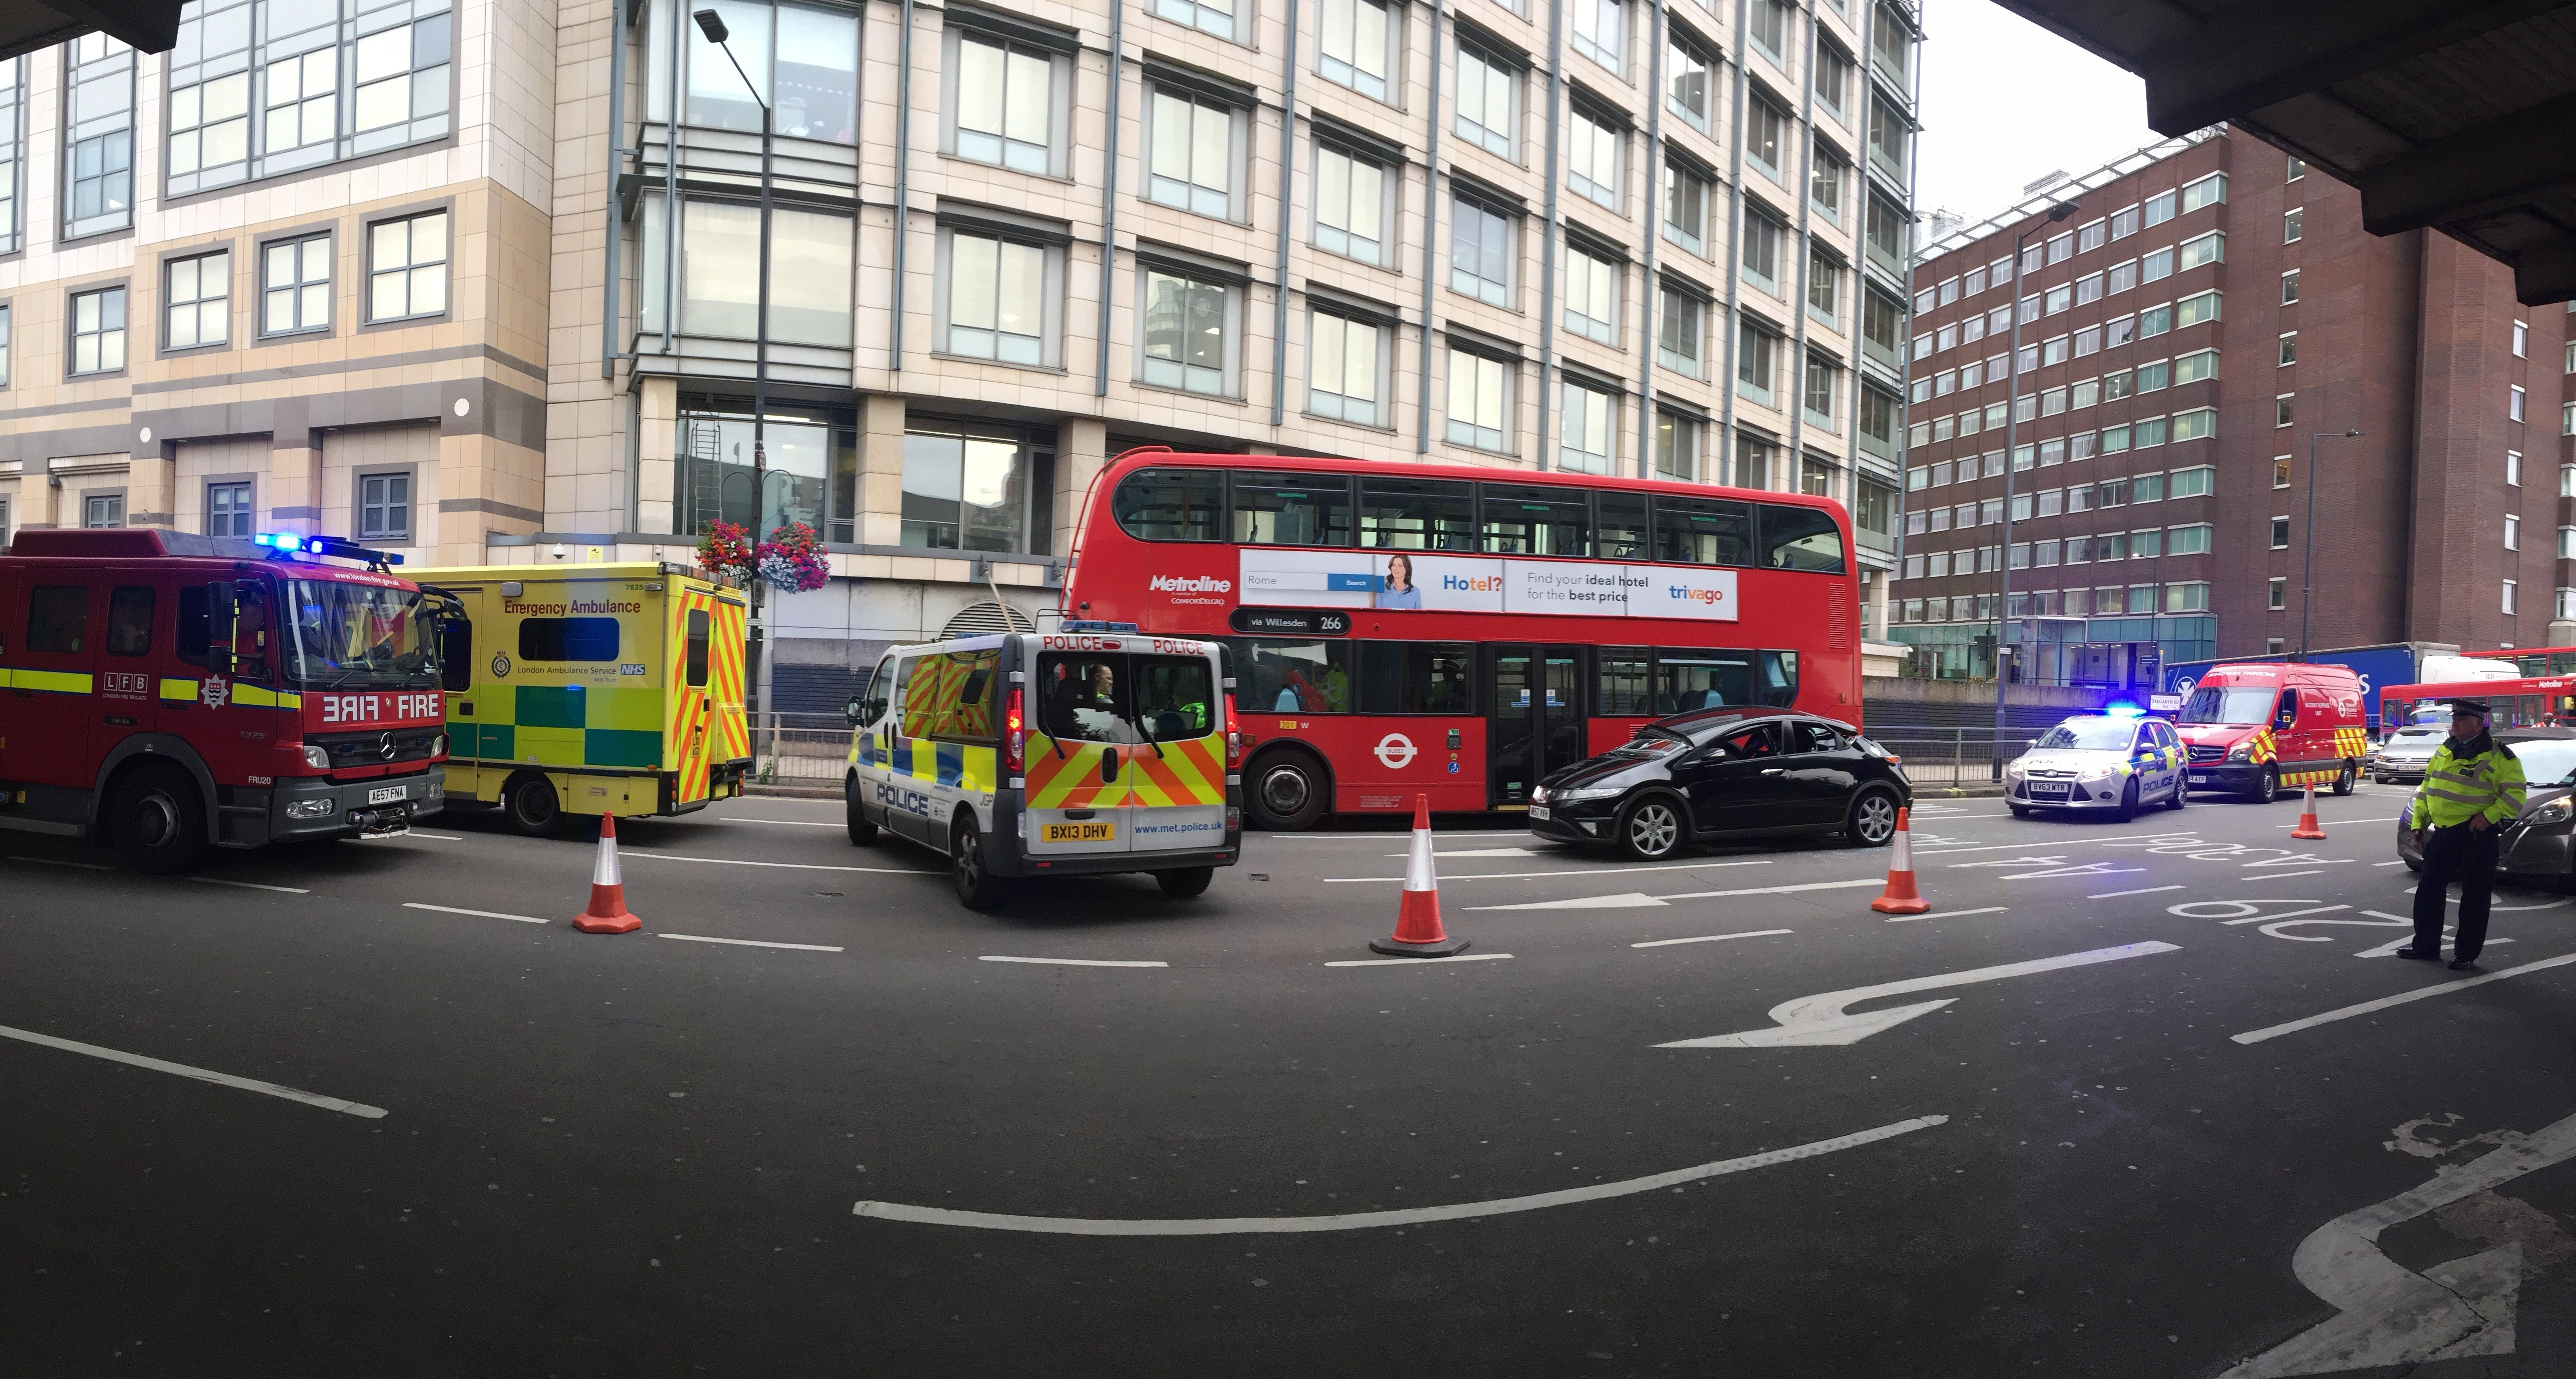 Ambulance stuck in traffic